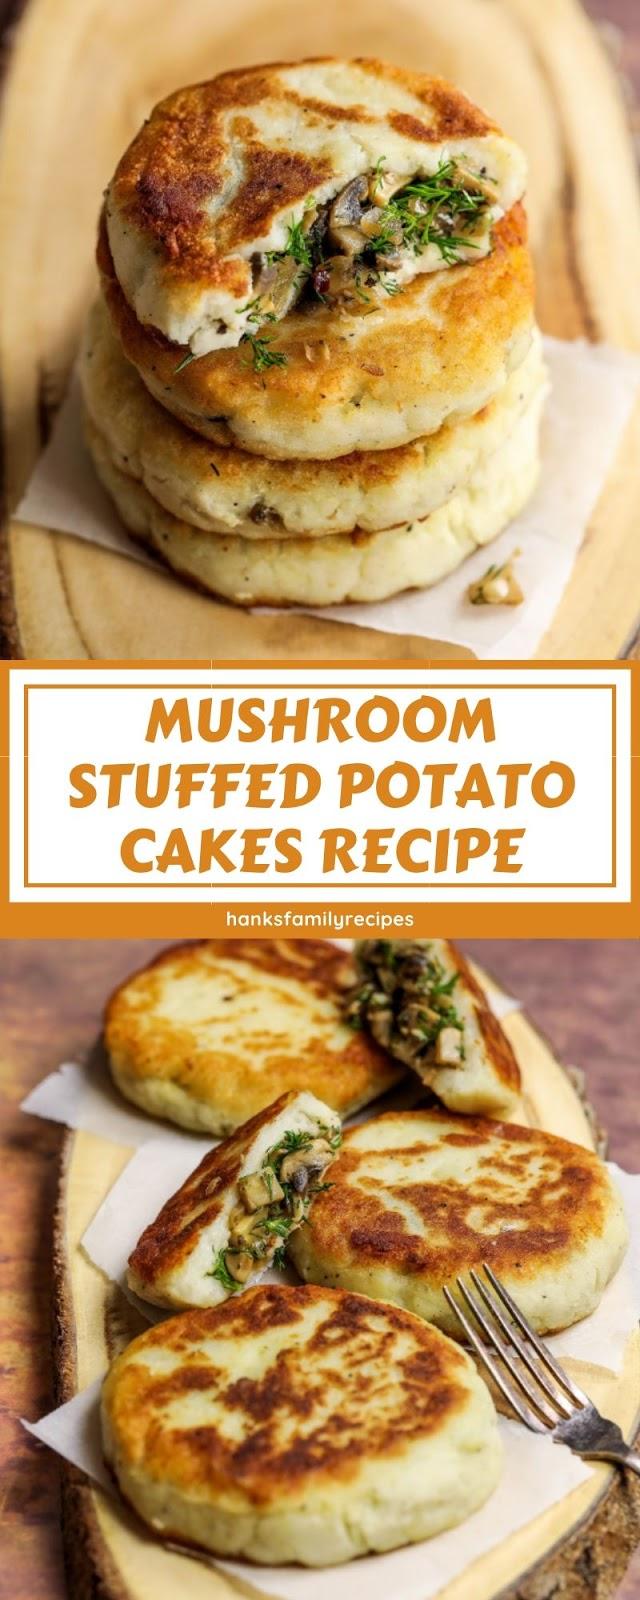 MUSHROOM STUFFED POTATO CAKES RECIPE